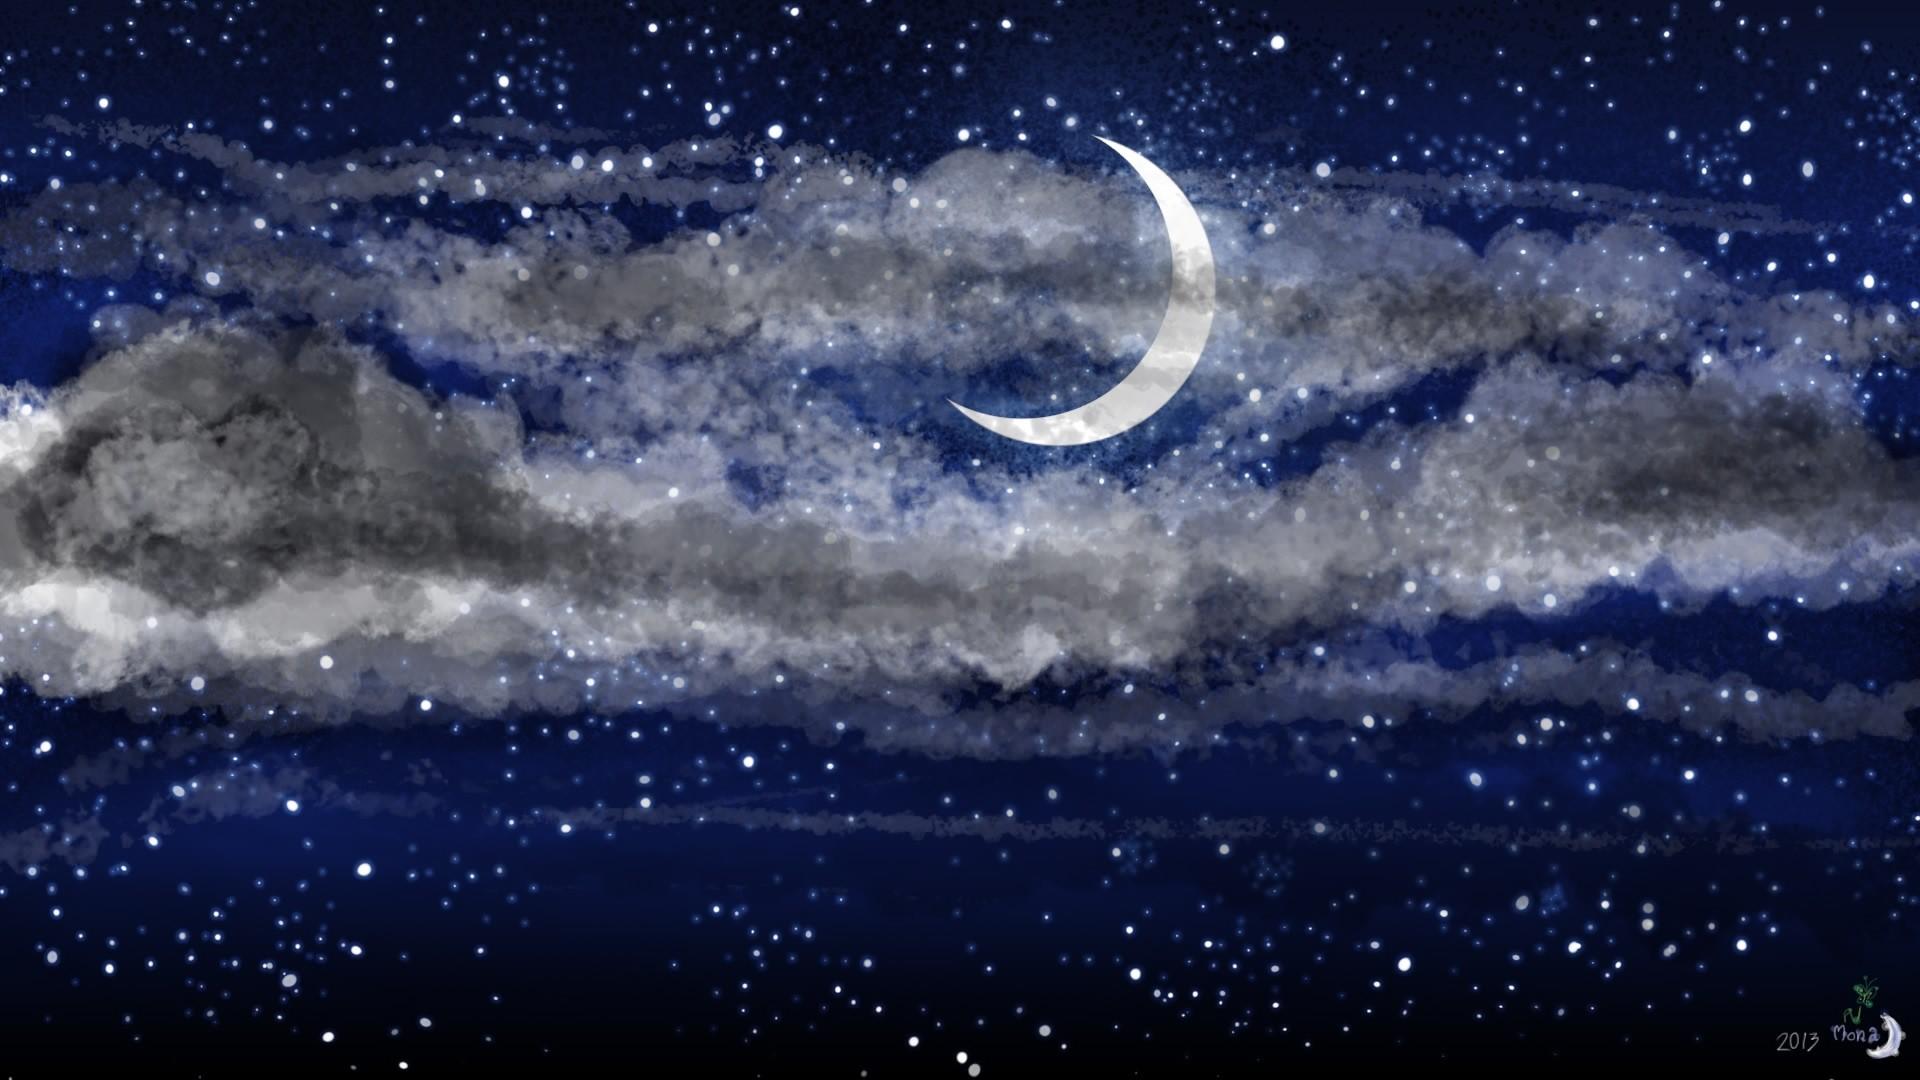 Moon And Stars hd wallpaper download